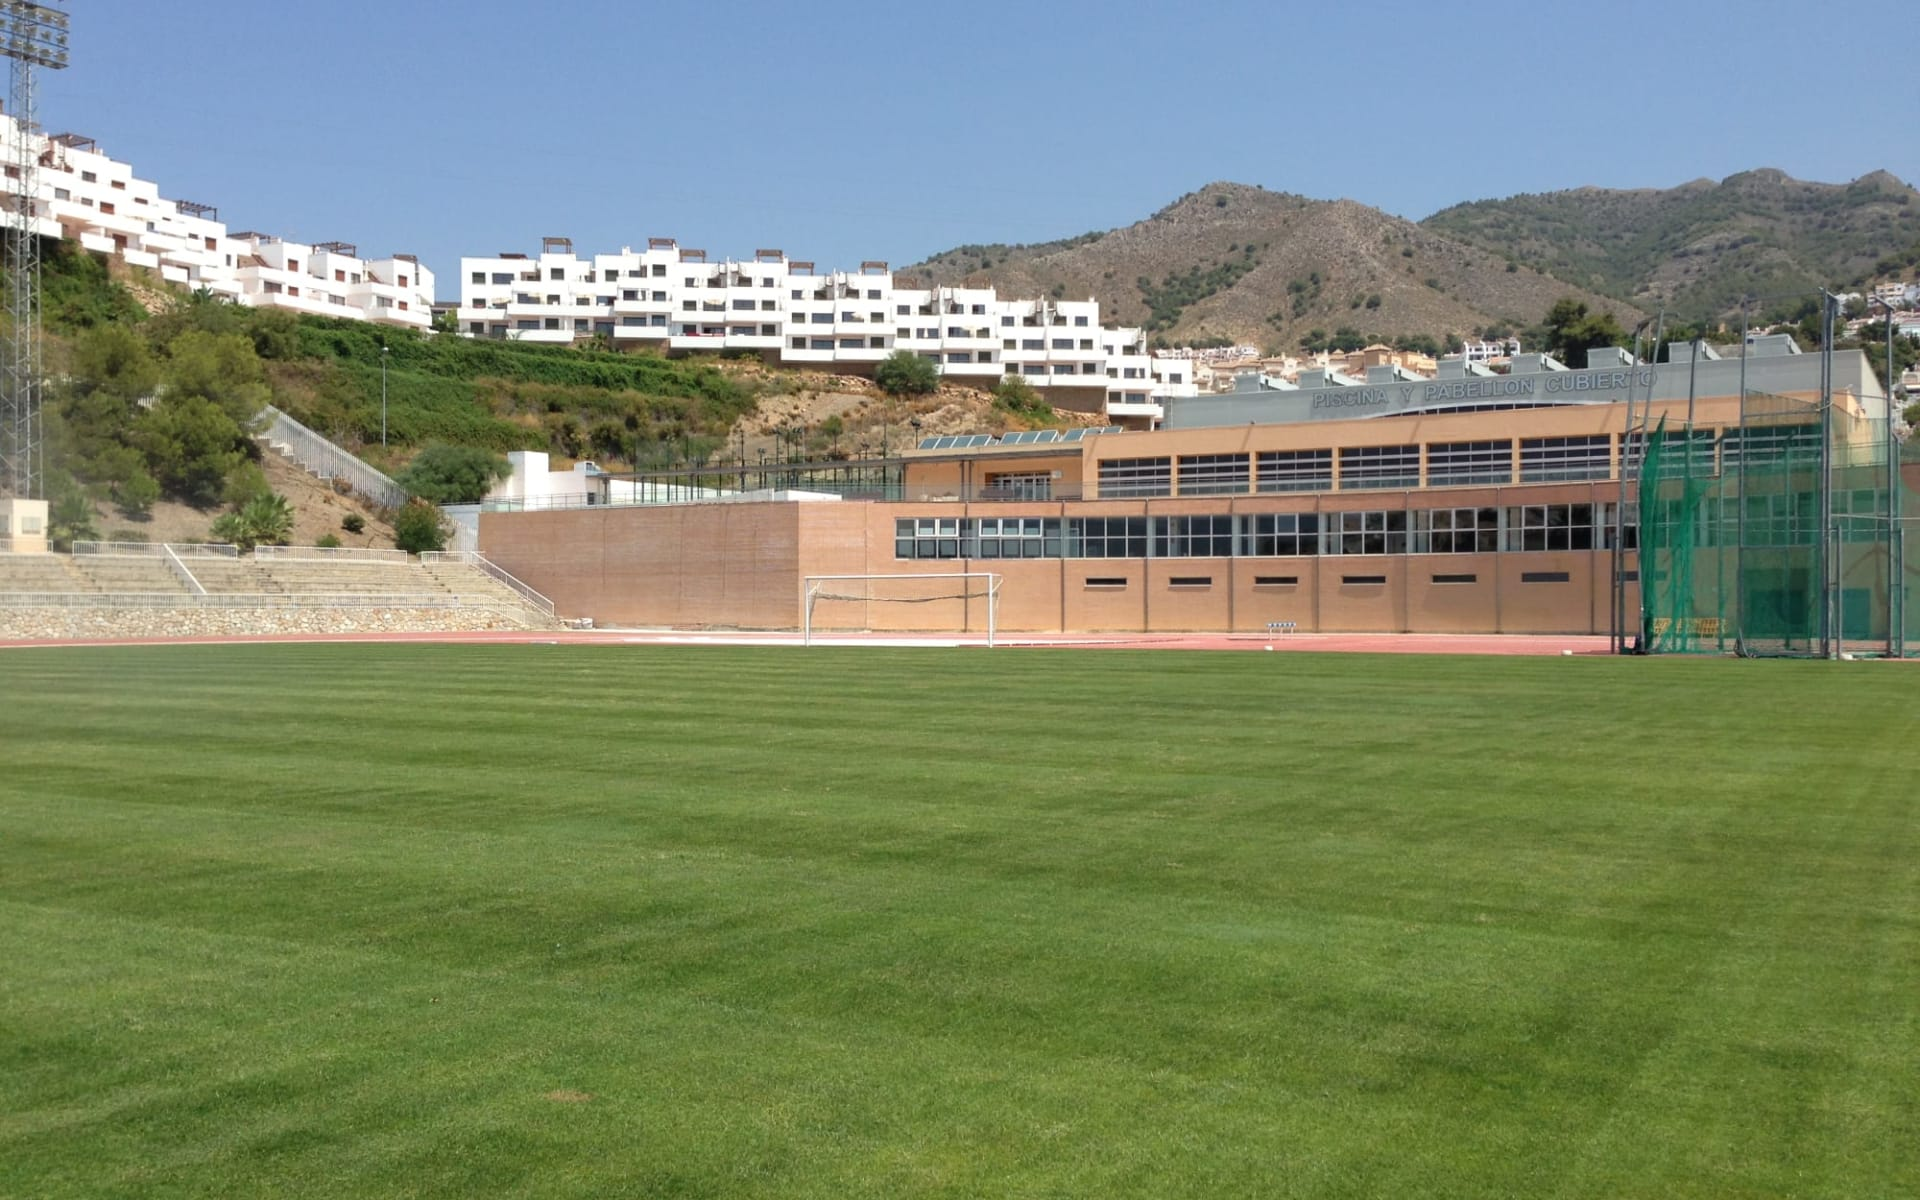 Nerja - Hotel Nerja Club ab Malaga: 186